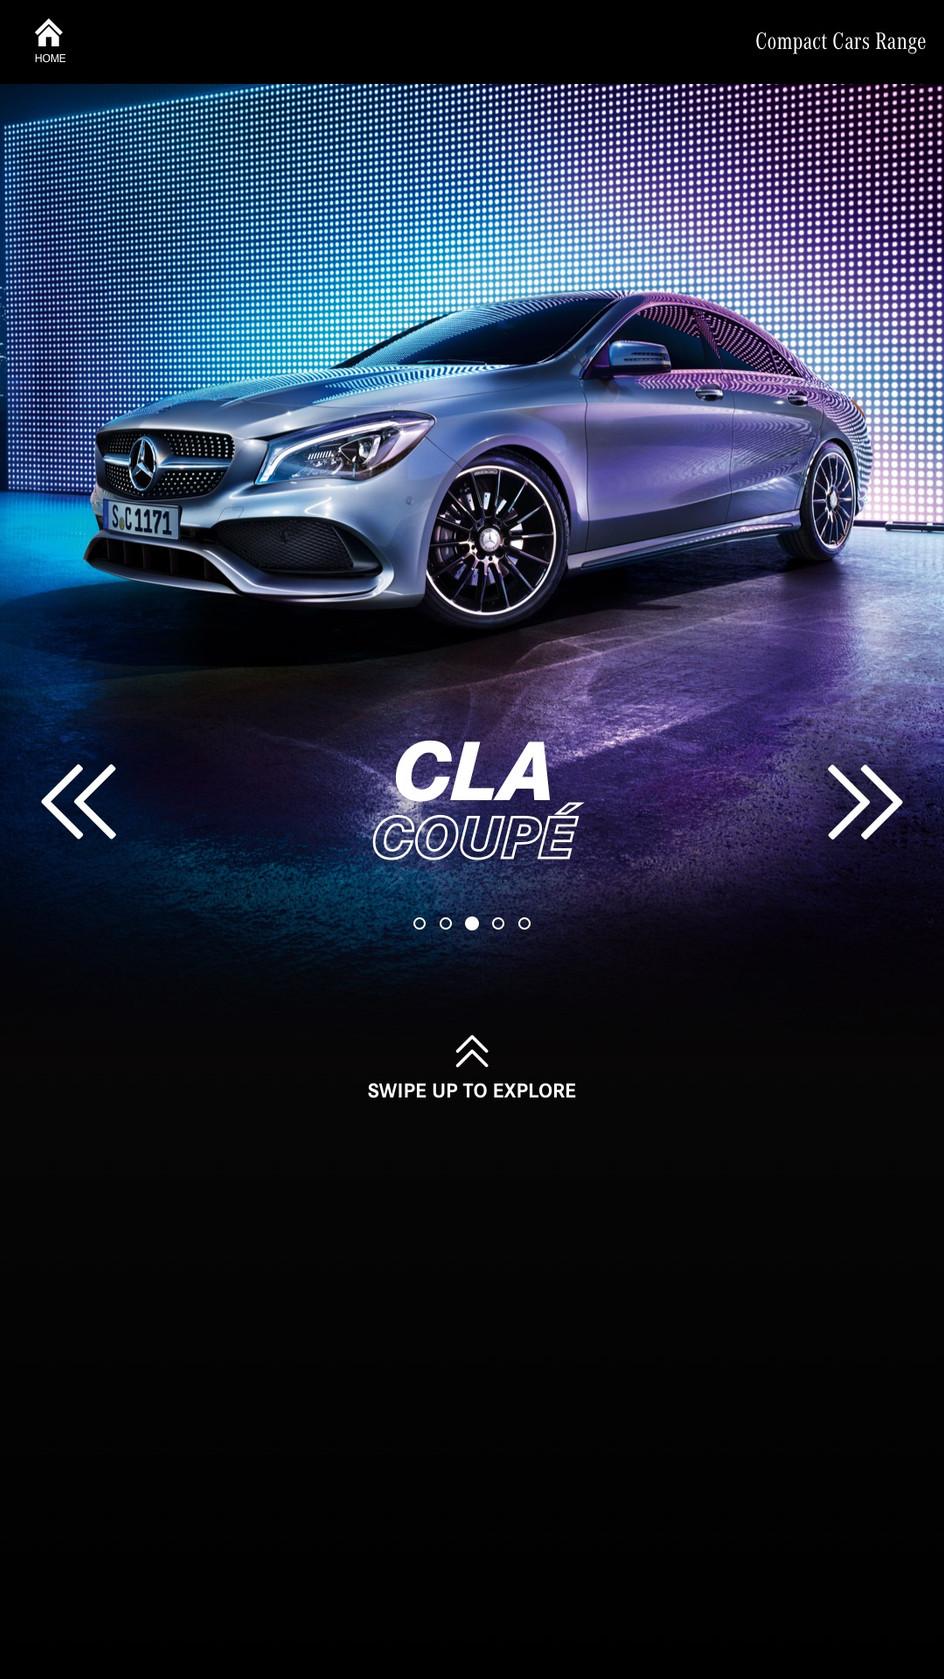 menu-cla coupe.jpg